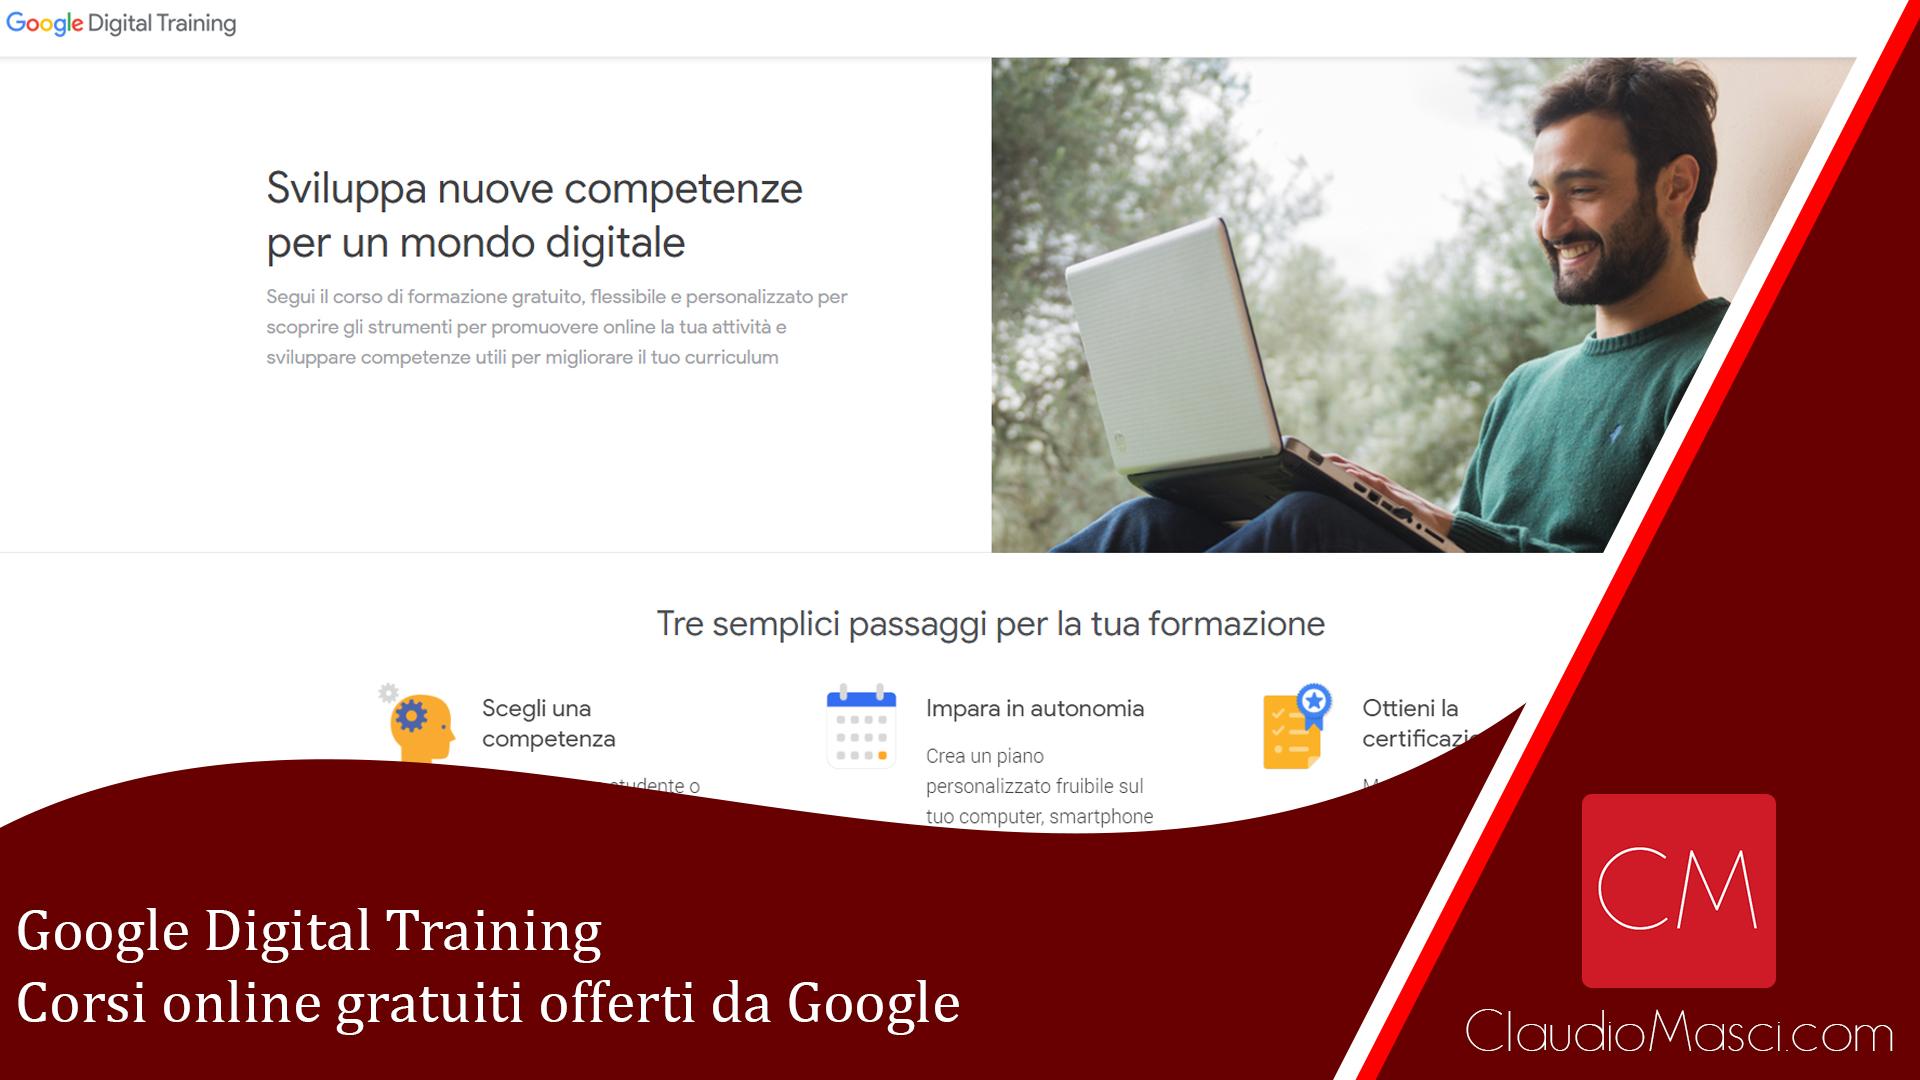 Google Digital Training – Corsi online gratuiti offerti da Google